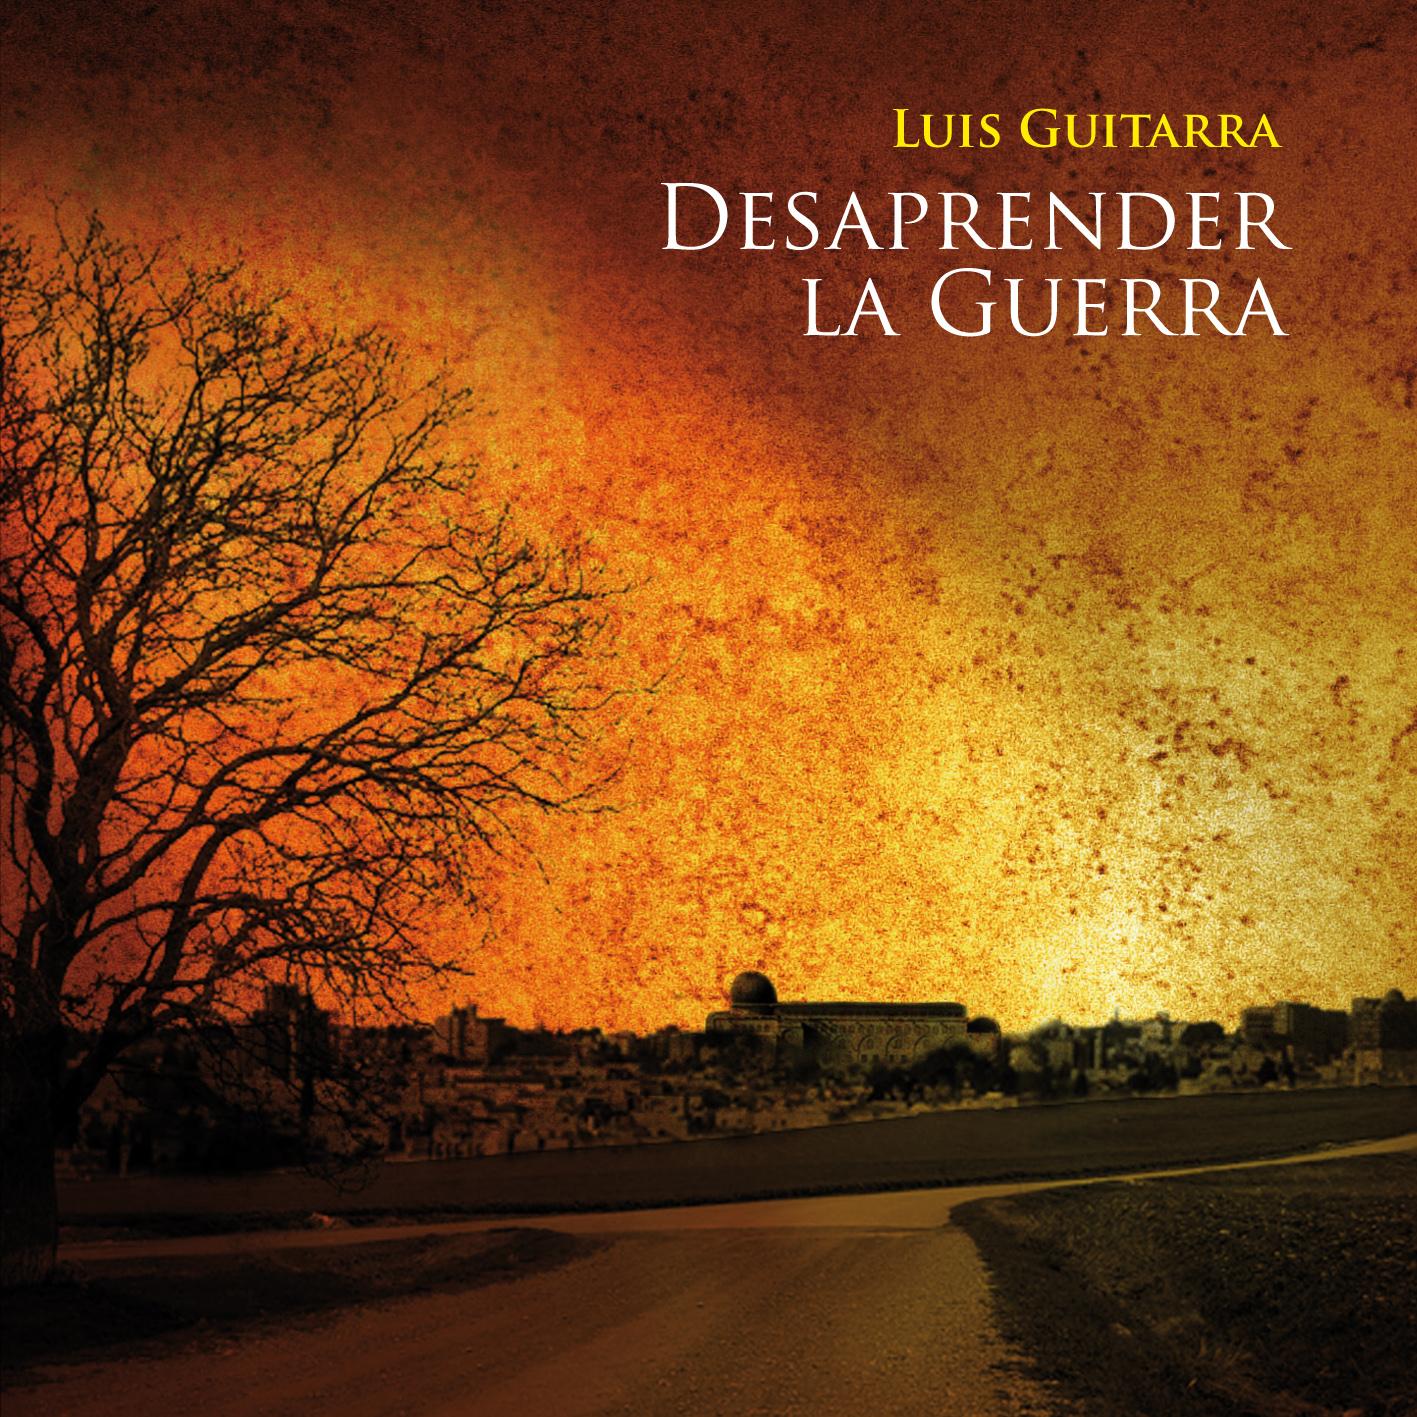 Portada DVD videoclip Desaprender la Guerra Luis Guitarra